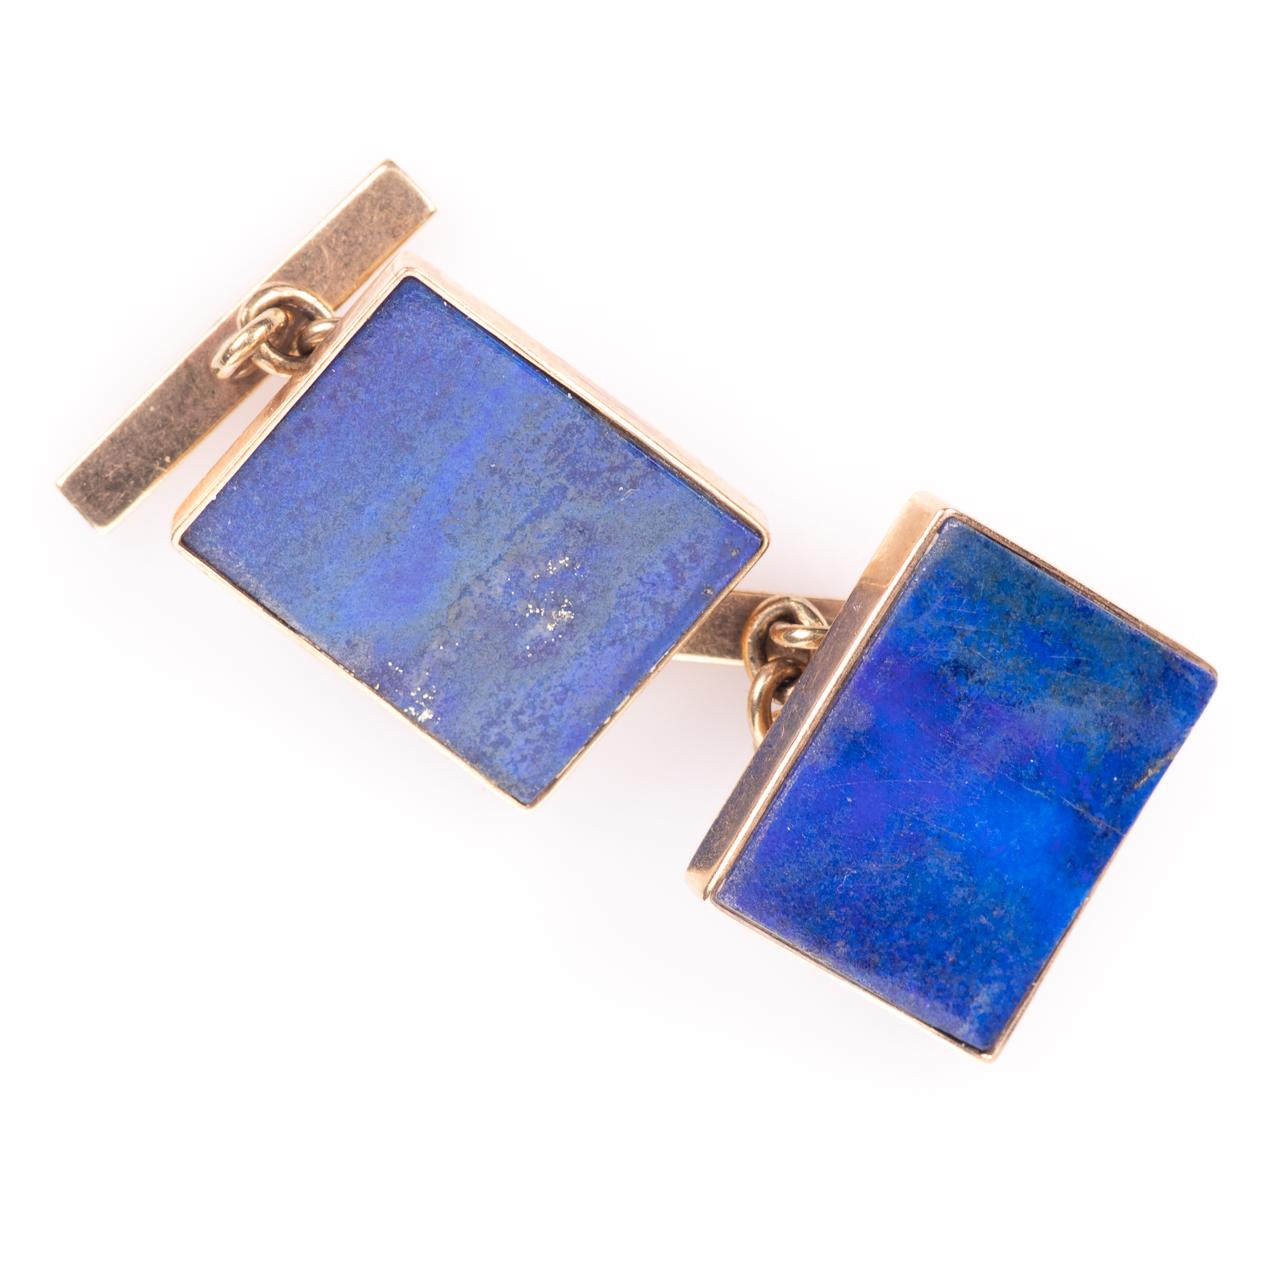 9ct Gold Gentleman's Lapis Lazuli Cufflinks